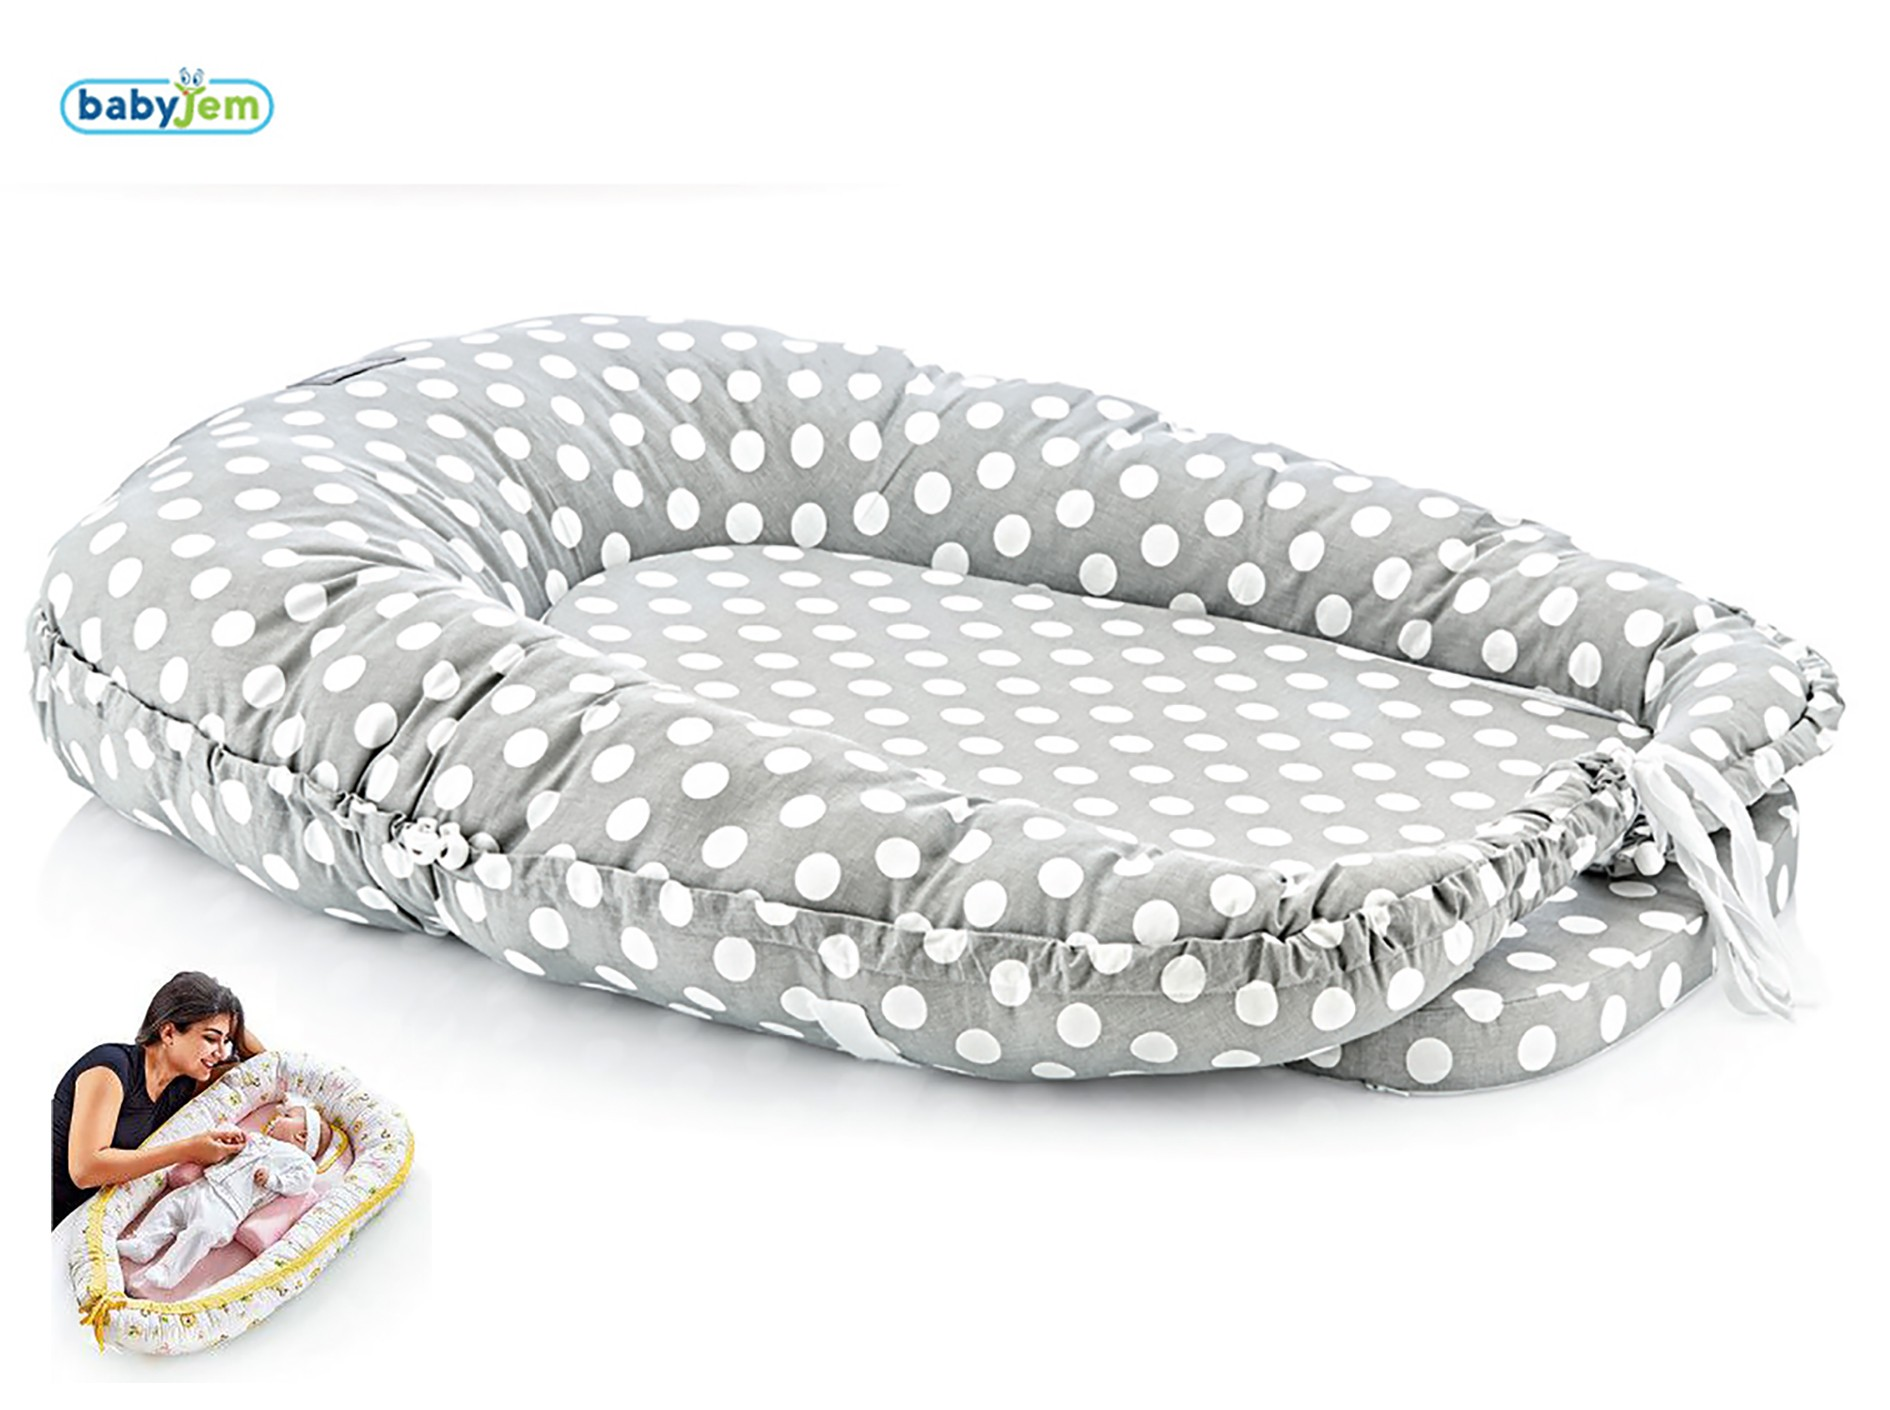 Image of BabyJem 5 Functions Cushion Grey Dots 35271